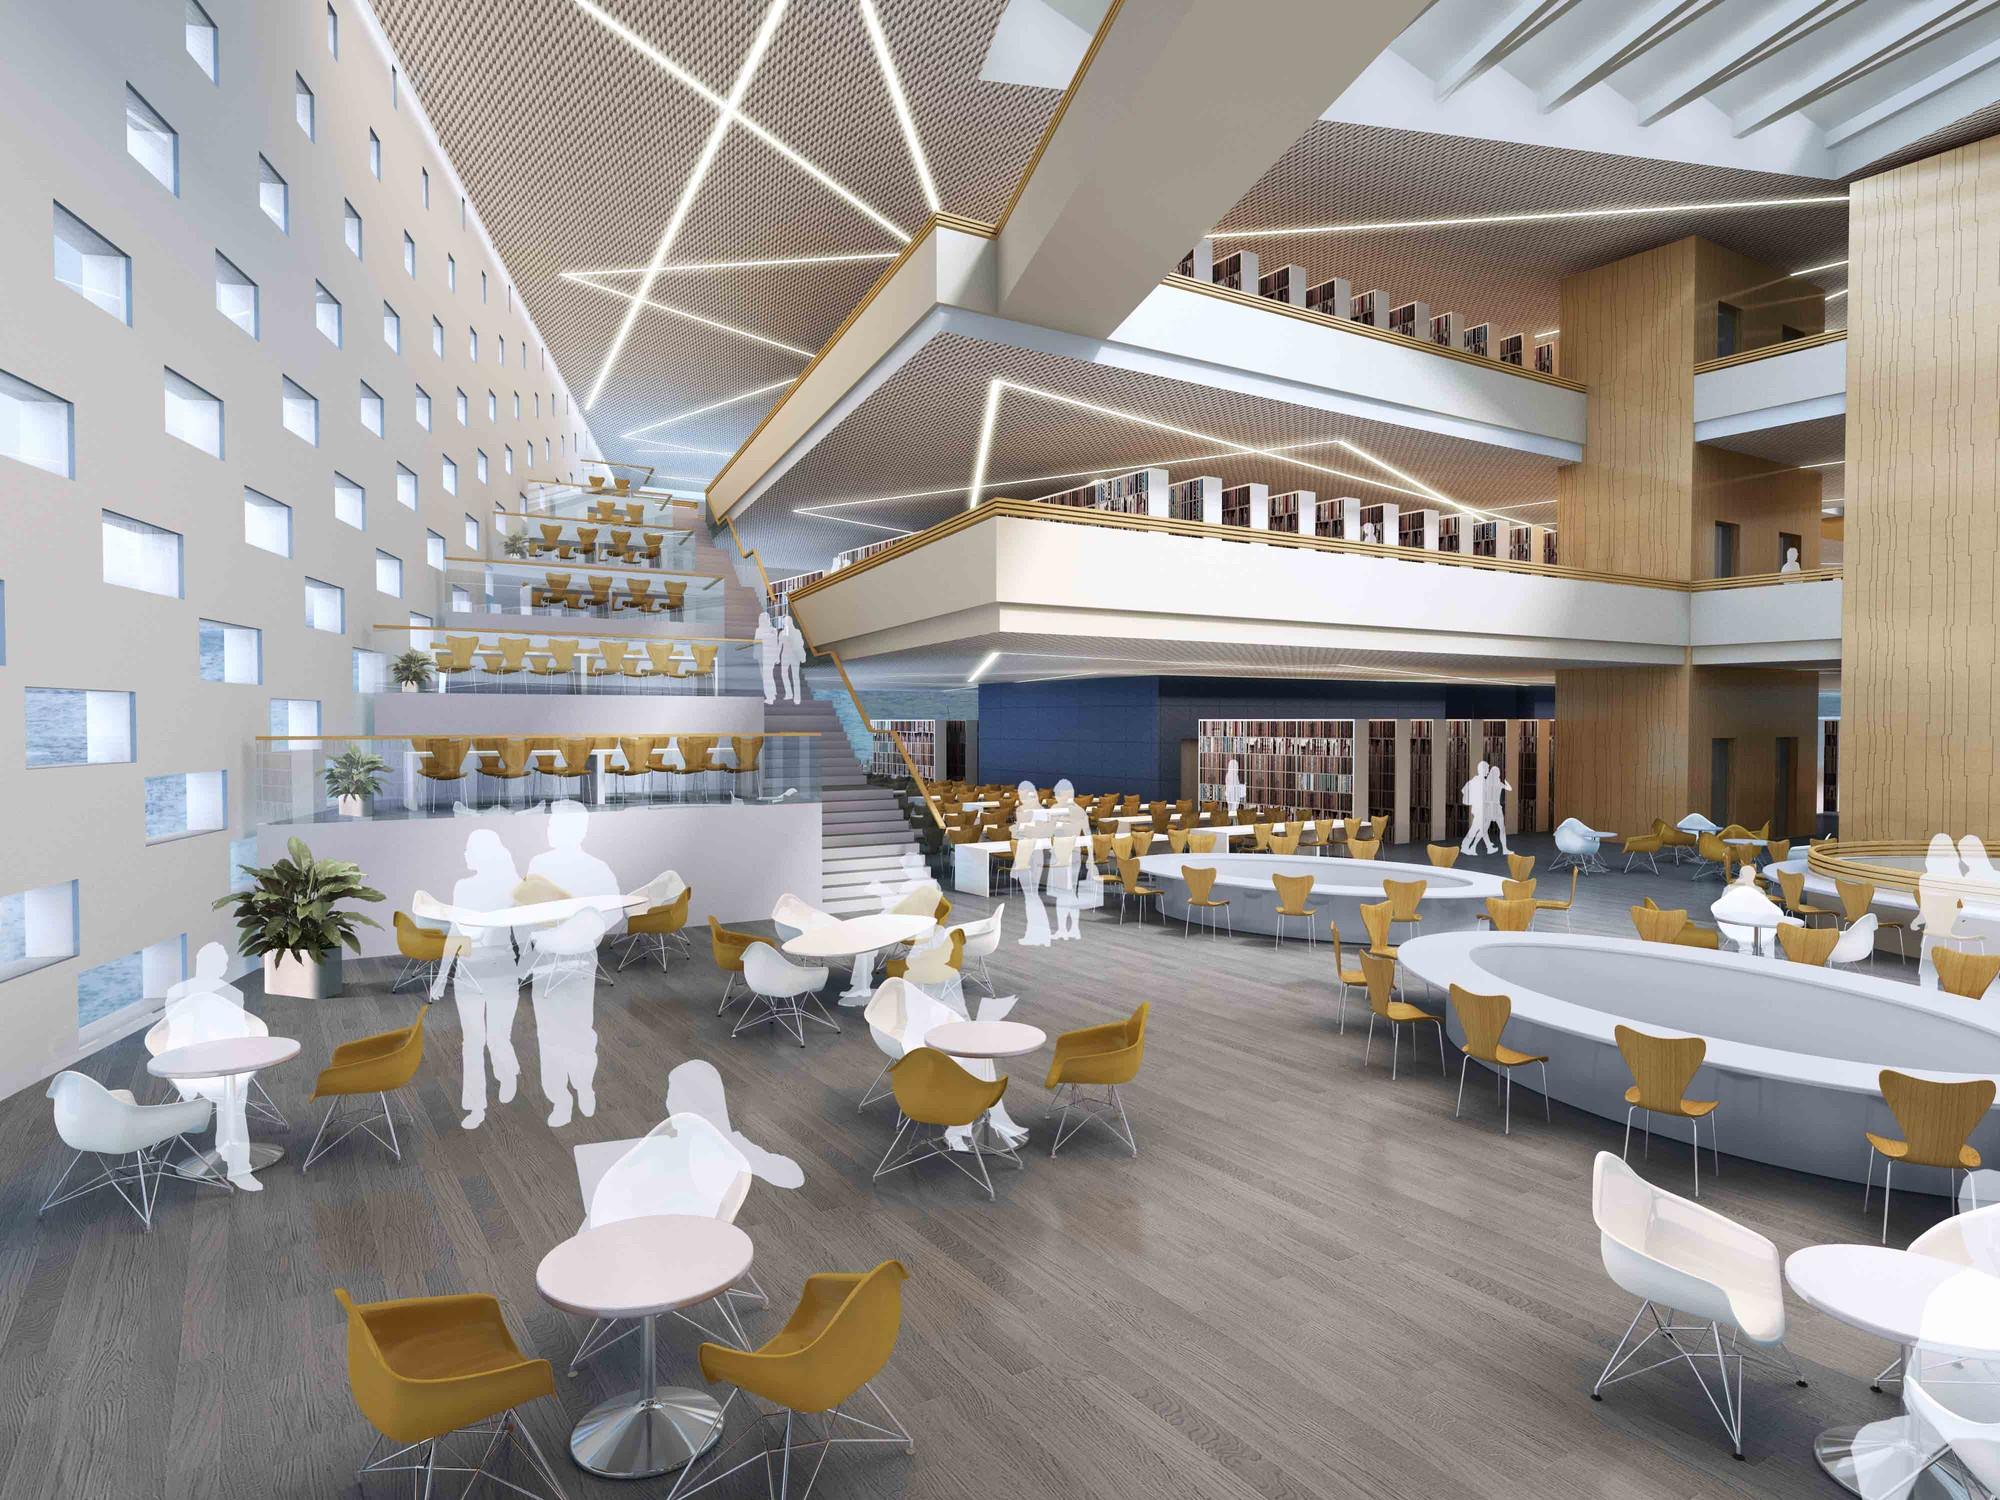 Hebei University Library Winning Proposal  Damian Donze